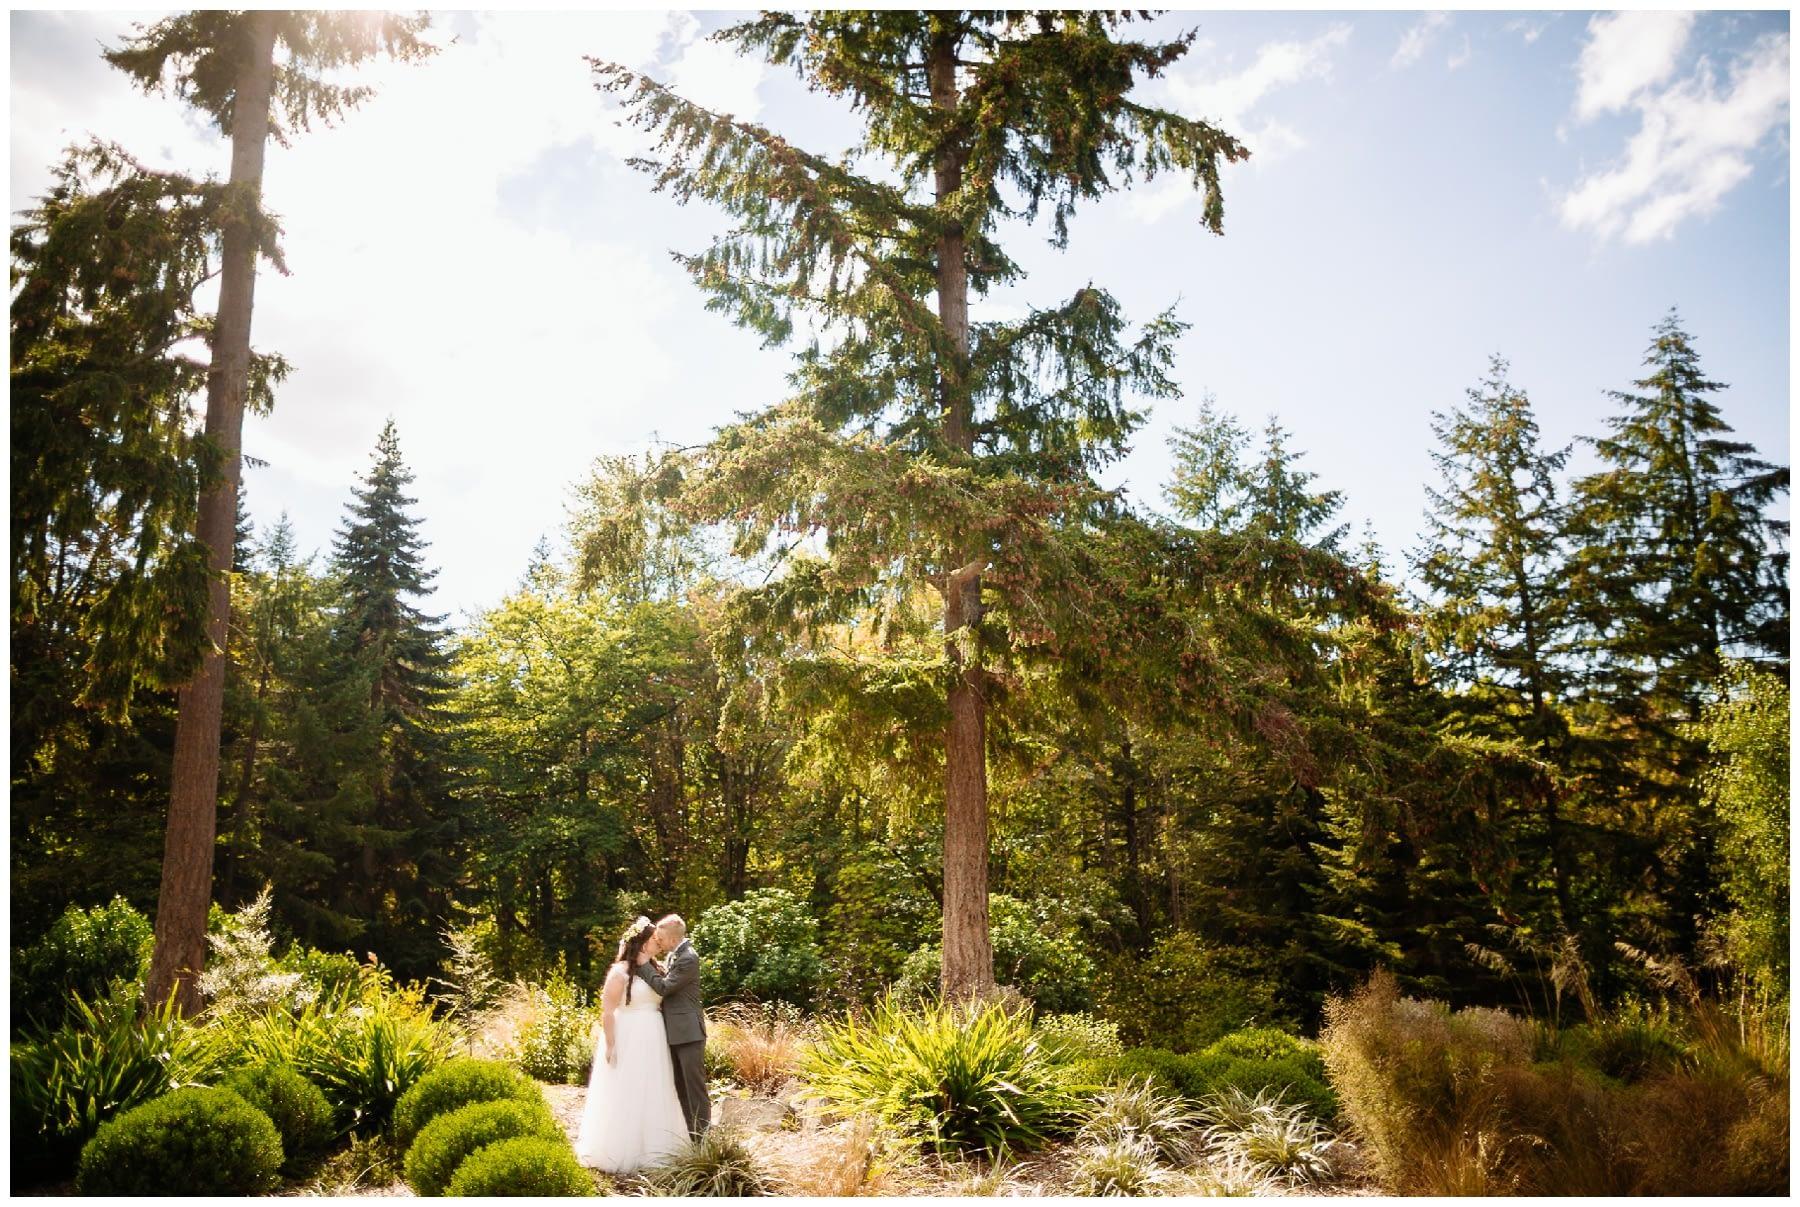 bride and groom stand in susnet washington park arboretum wedding